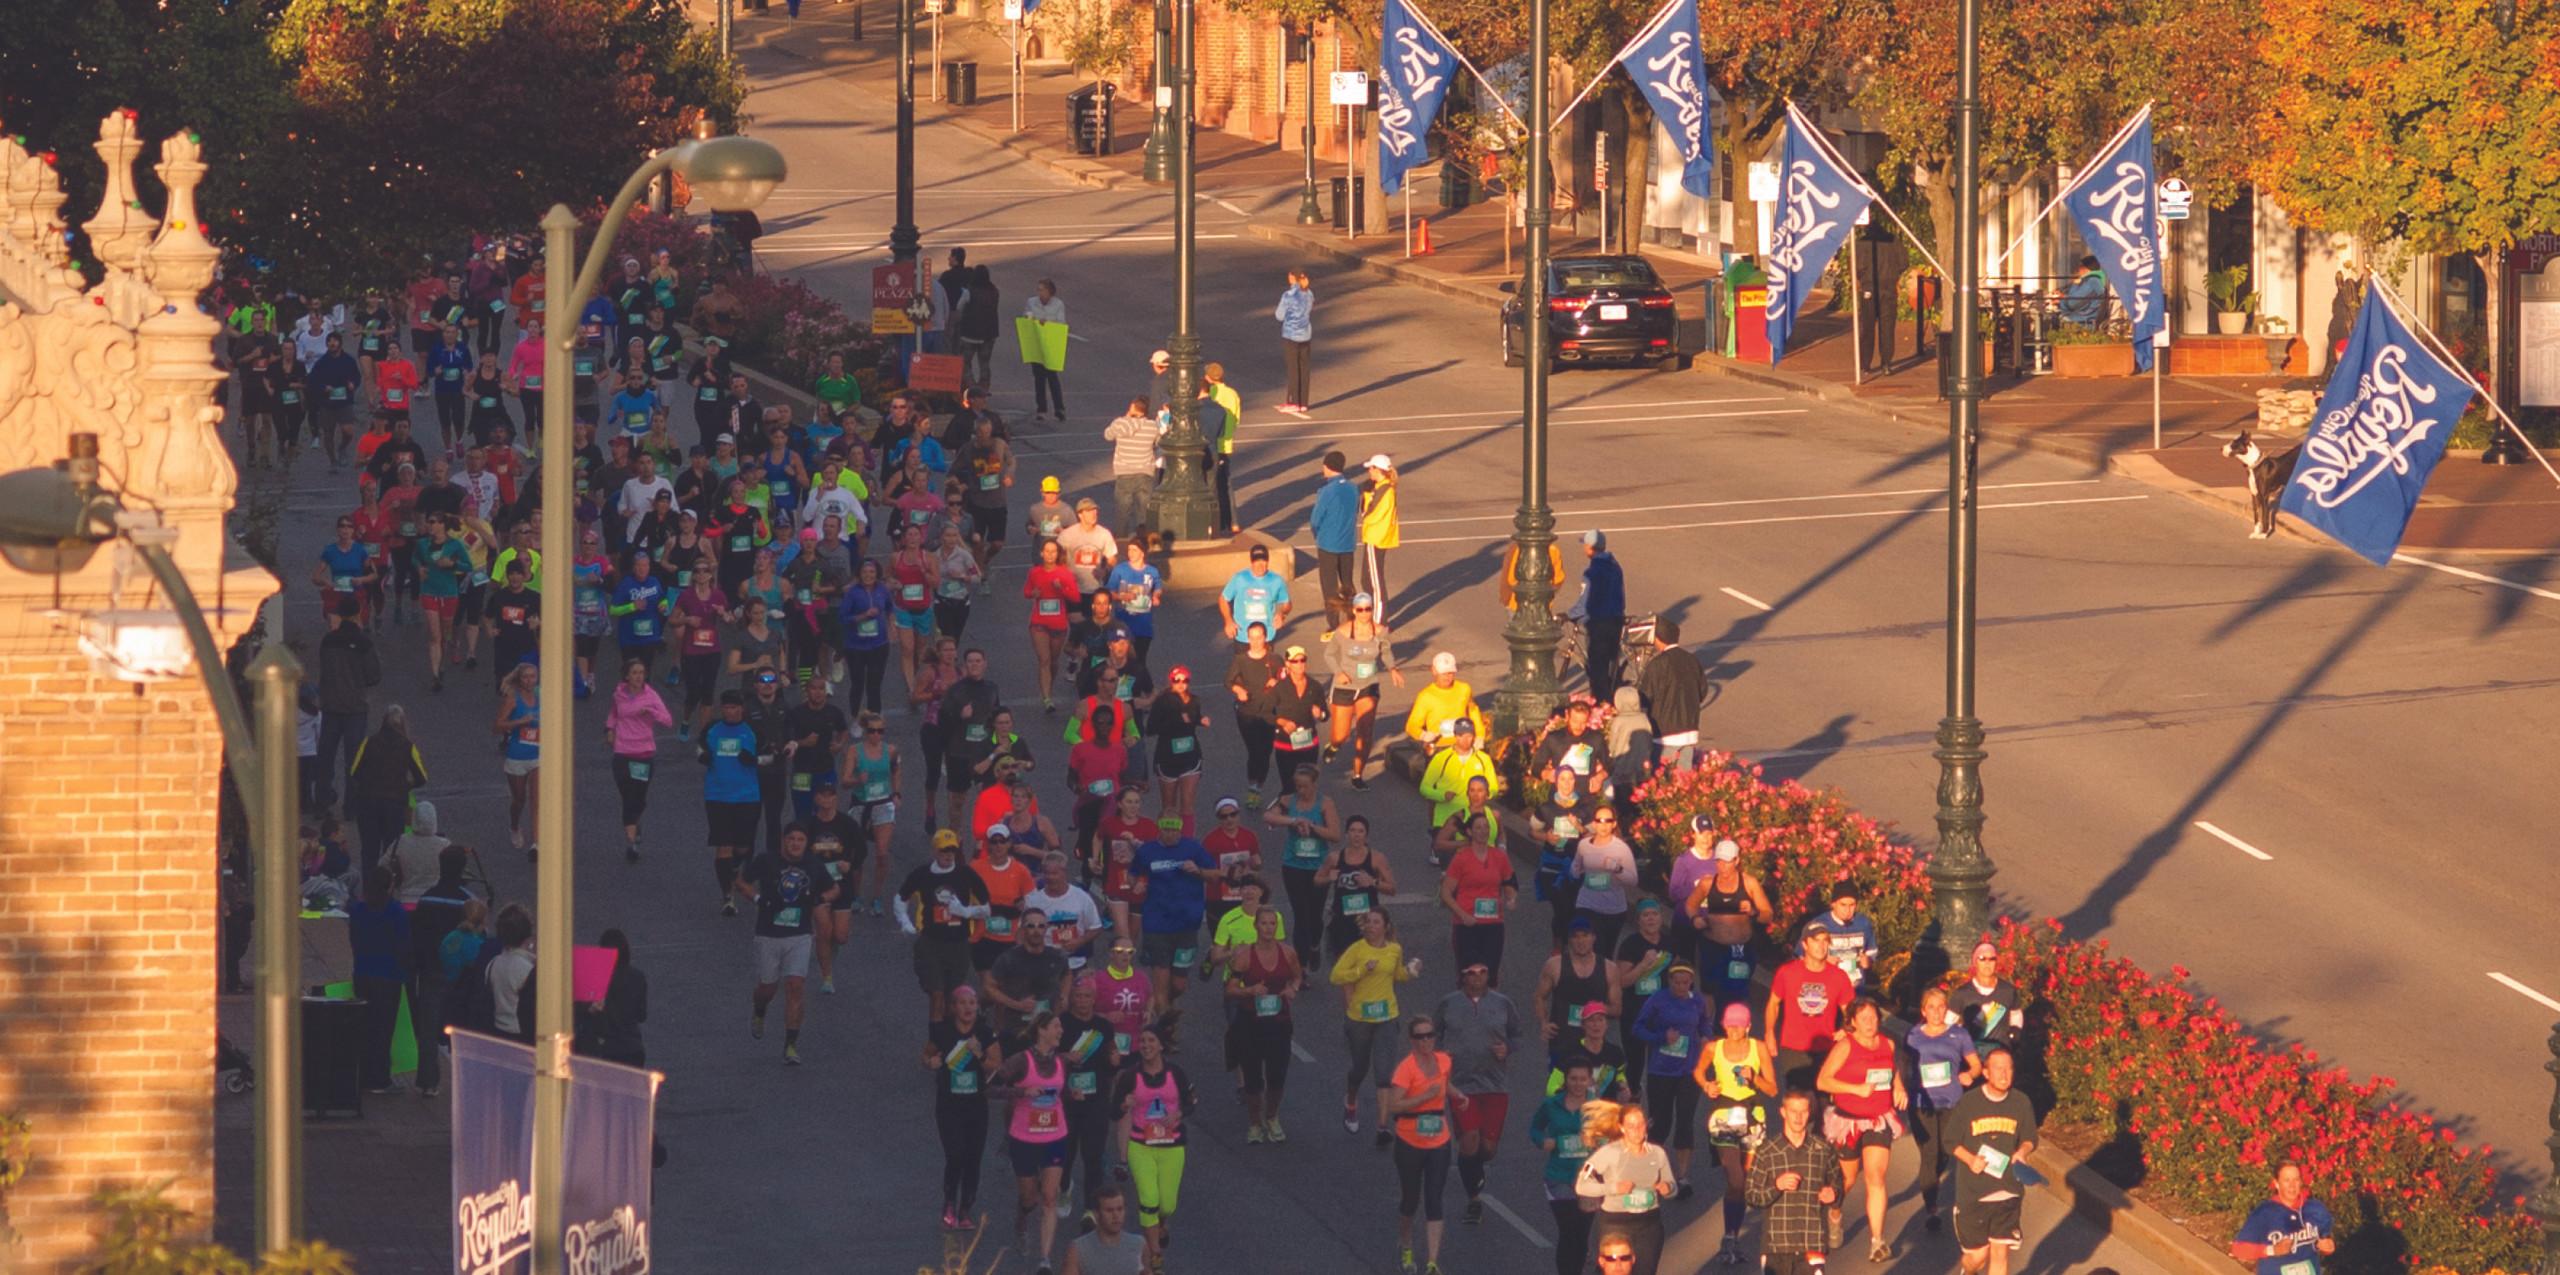 KC marathon and half marathon